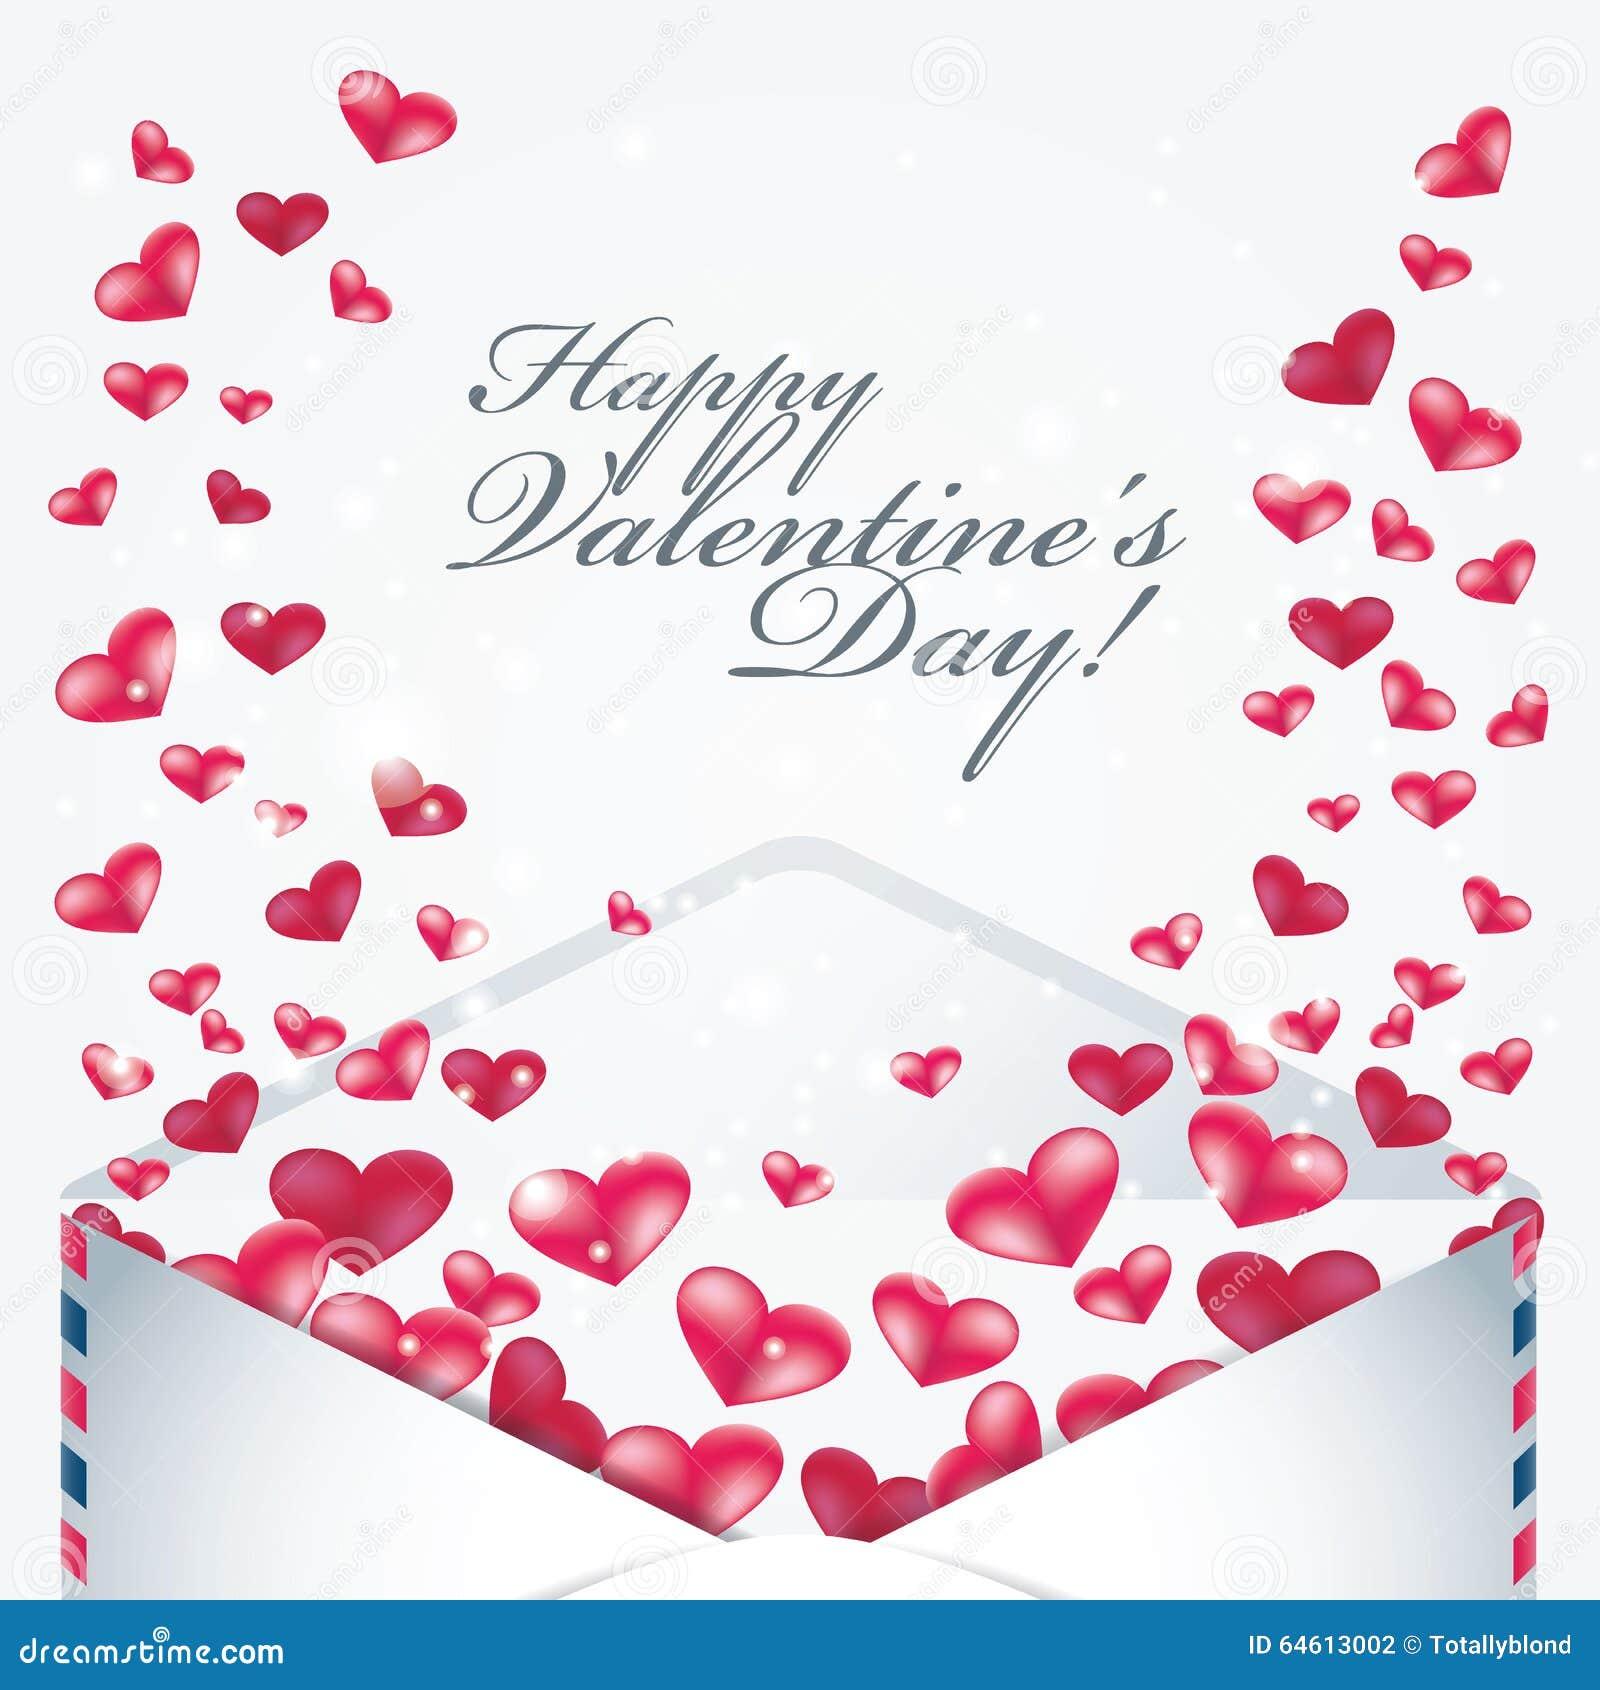 Valentine Day Cards Design With Hearts Illustration Image – Valentine Cards Design